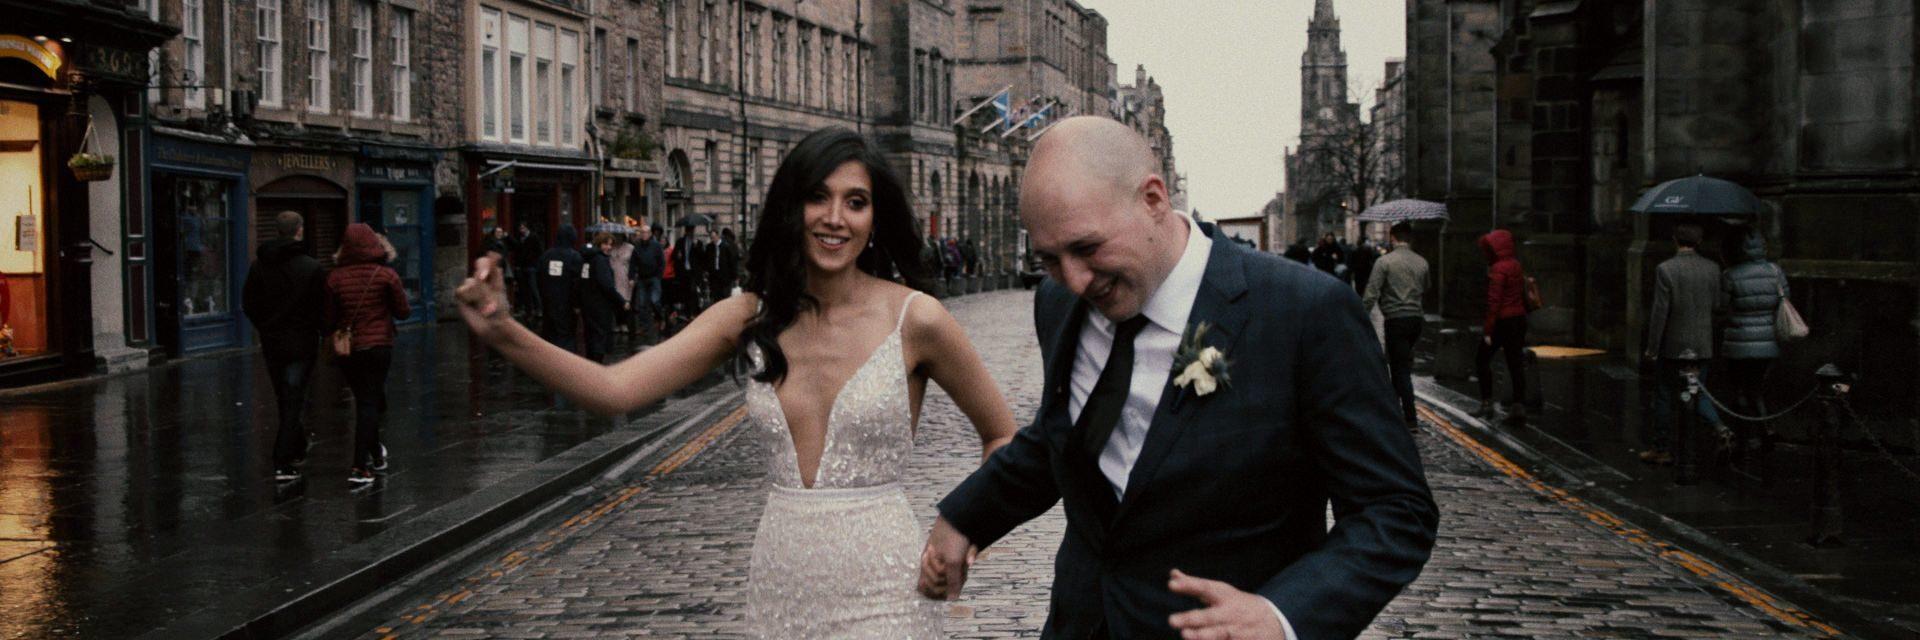 Skogafoss-wedding-videographer-cinemate-films-04